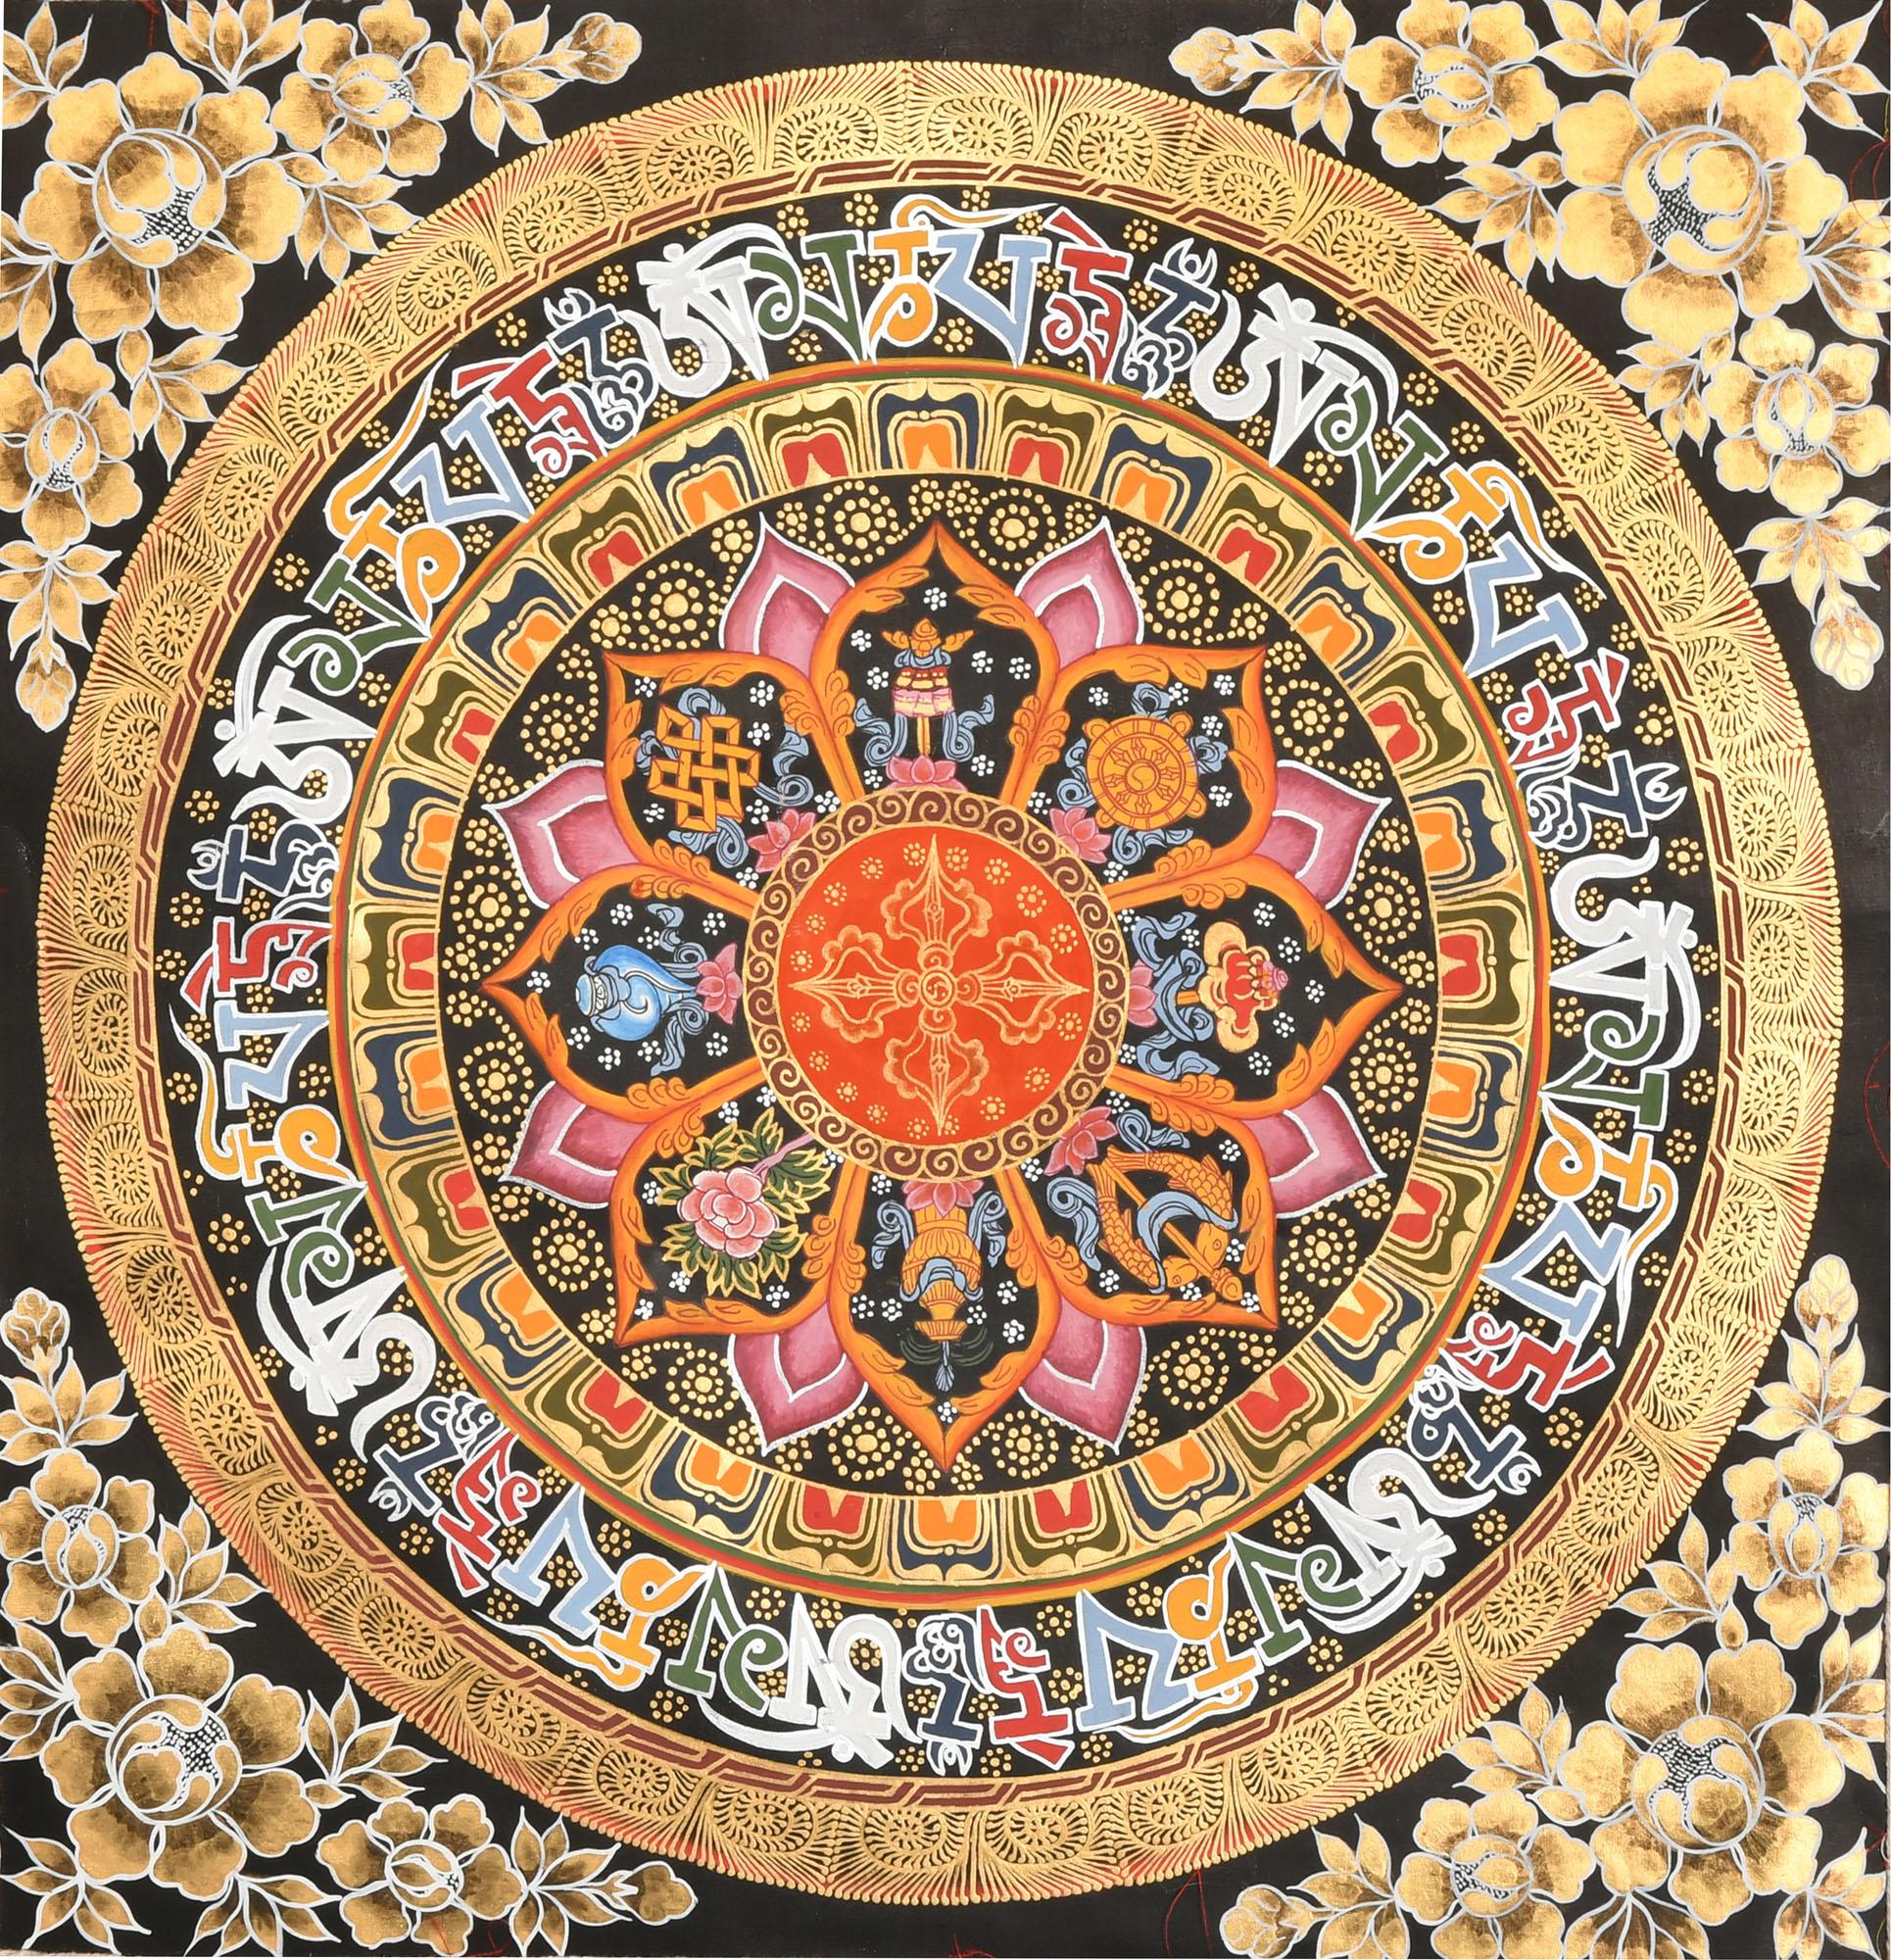 Vishva-Vajra Mandala with Ashtamangala Symbols (Tibetan